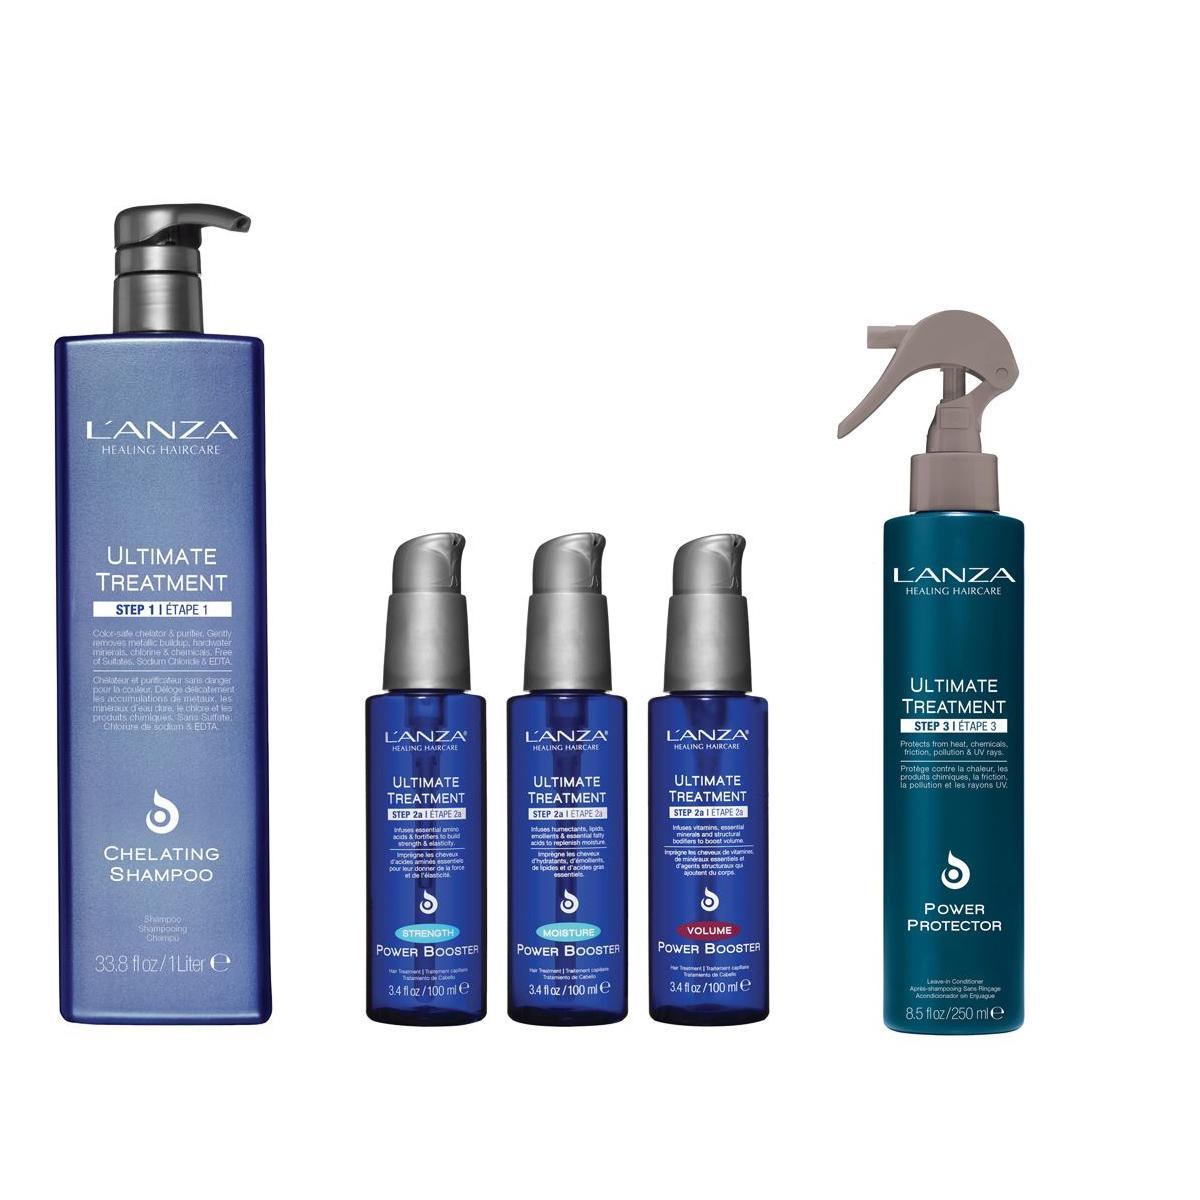 Kit Lanza Treatment Shampoo 1L Power Protector250ml e 3 Booster 100ml